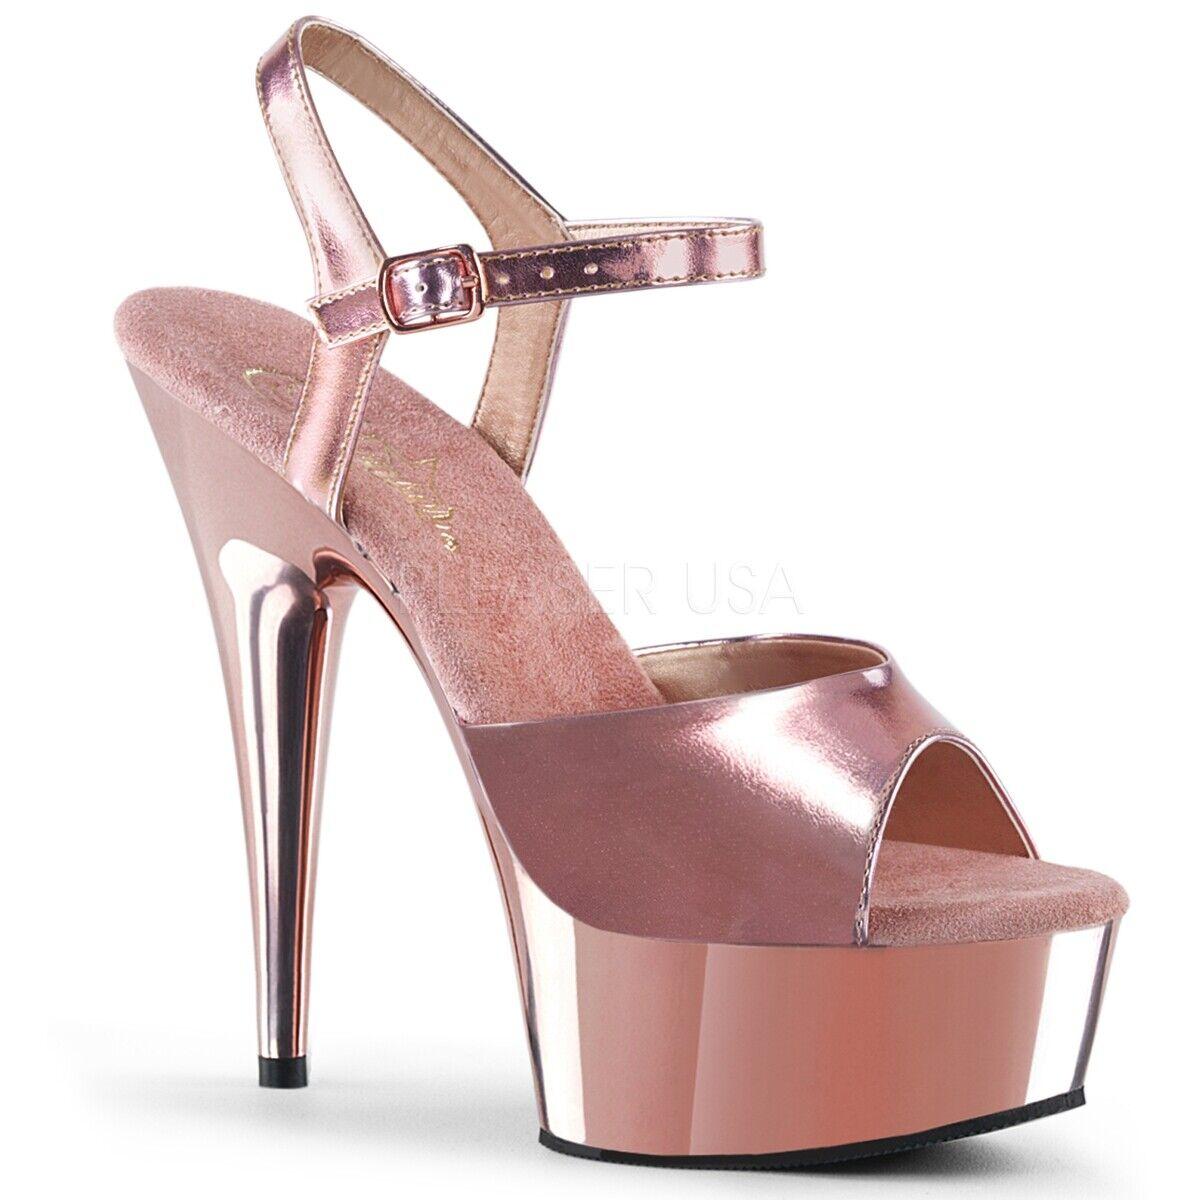 Pleaser Delight-609 shoes pink gold Chrome Ankle Strap Platform Strappy Sandals